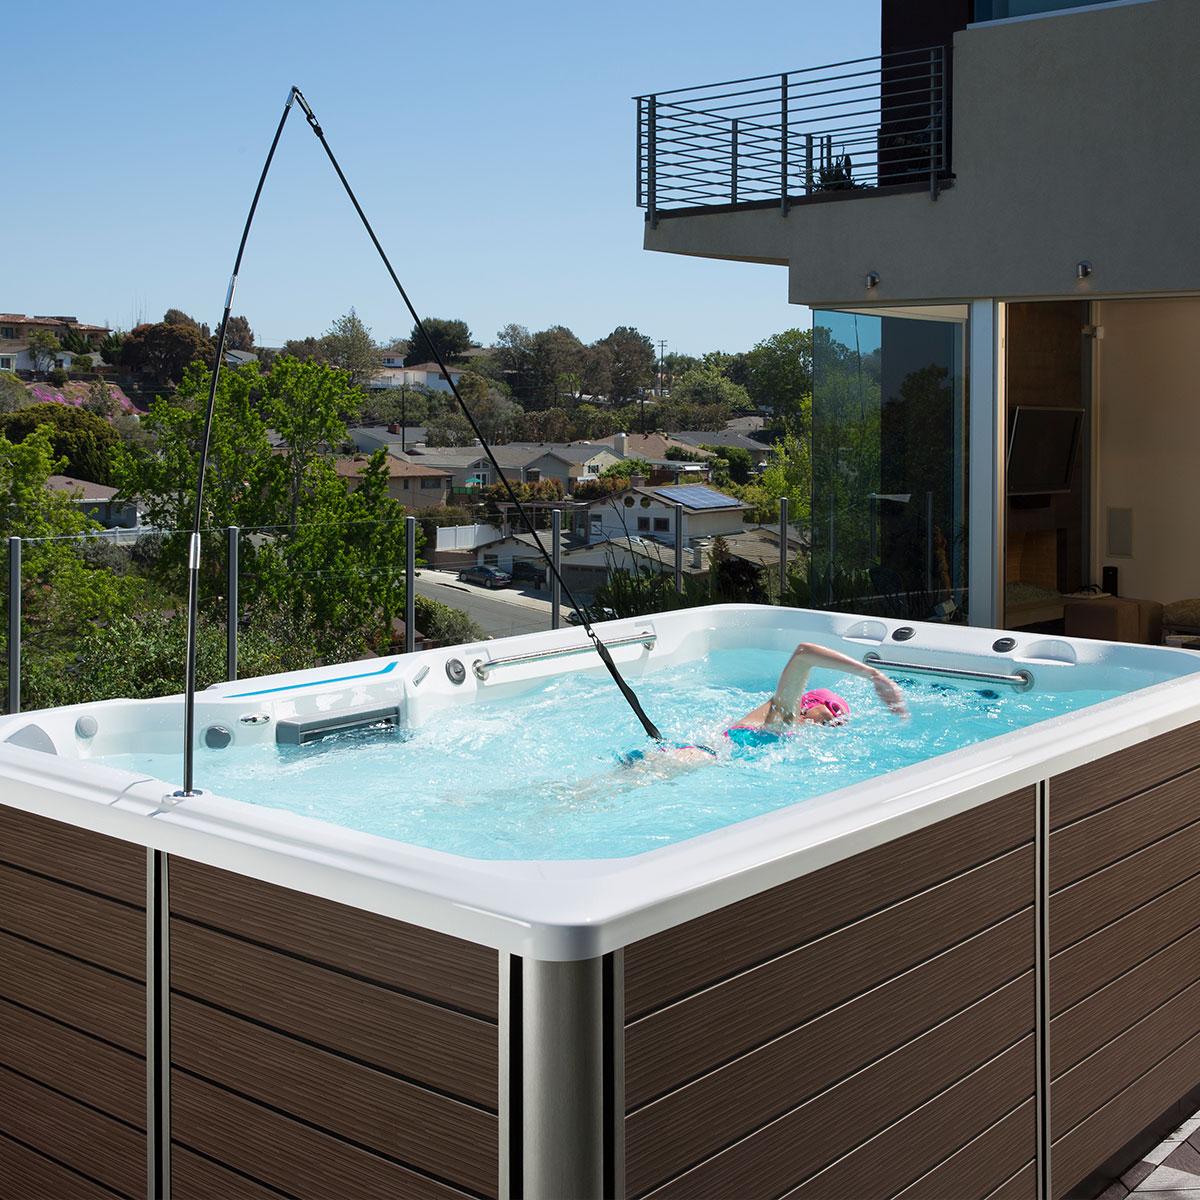 Swim Tether Allen Pools Amp Spas